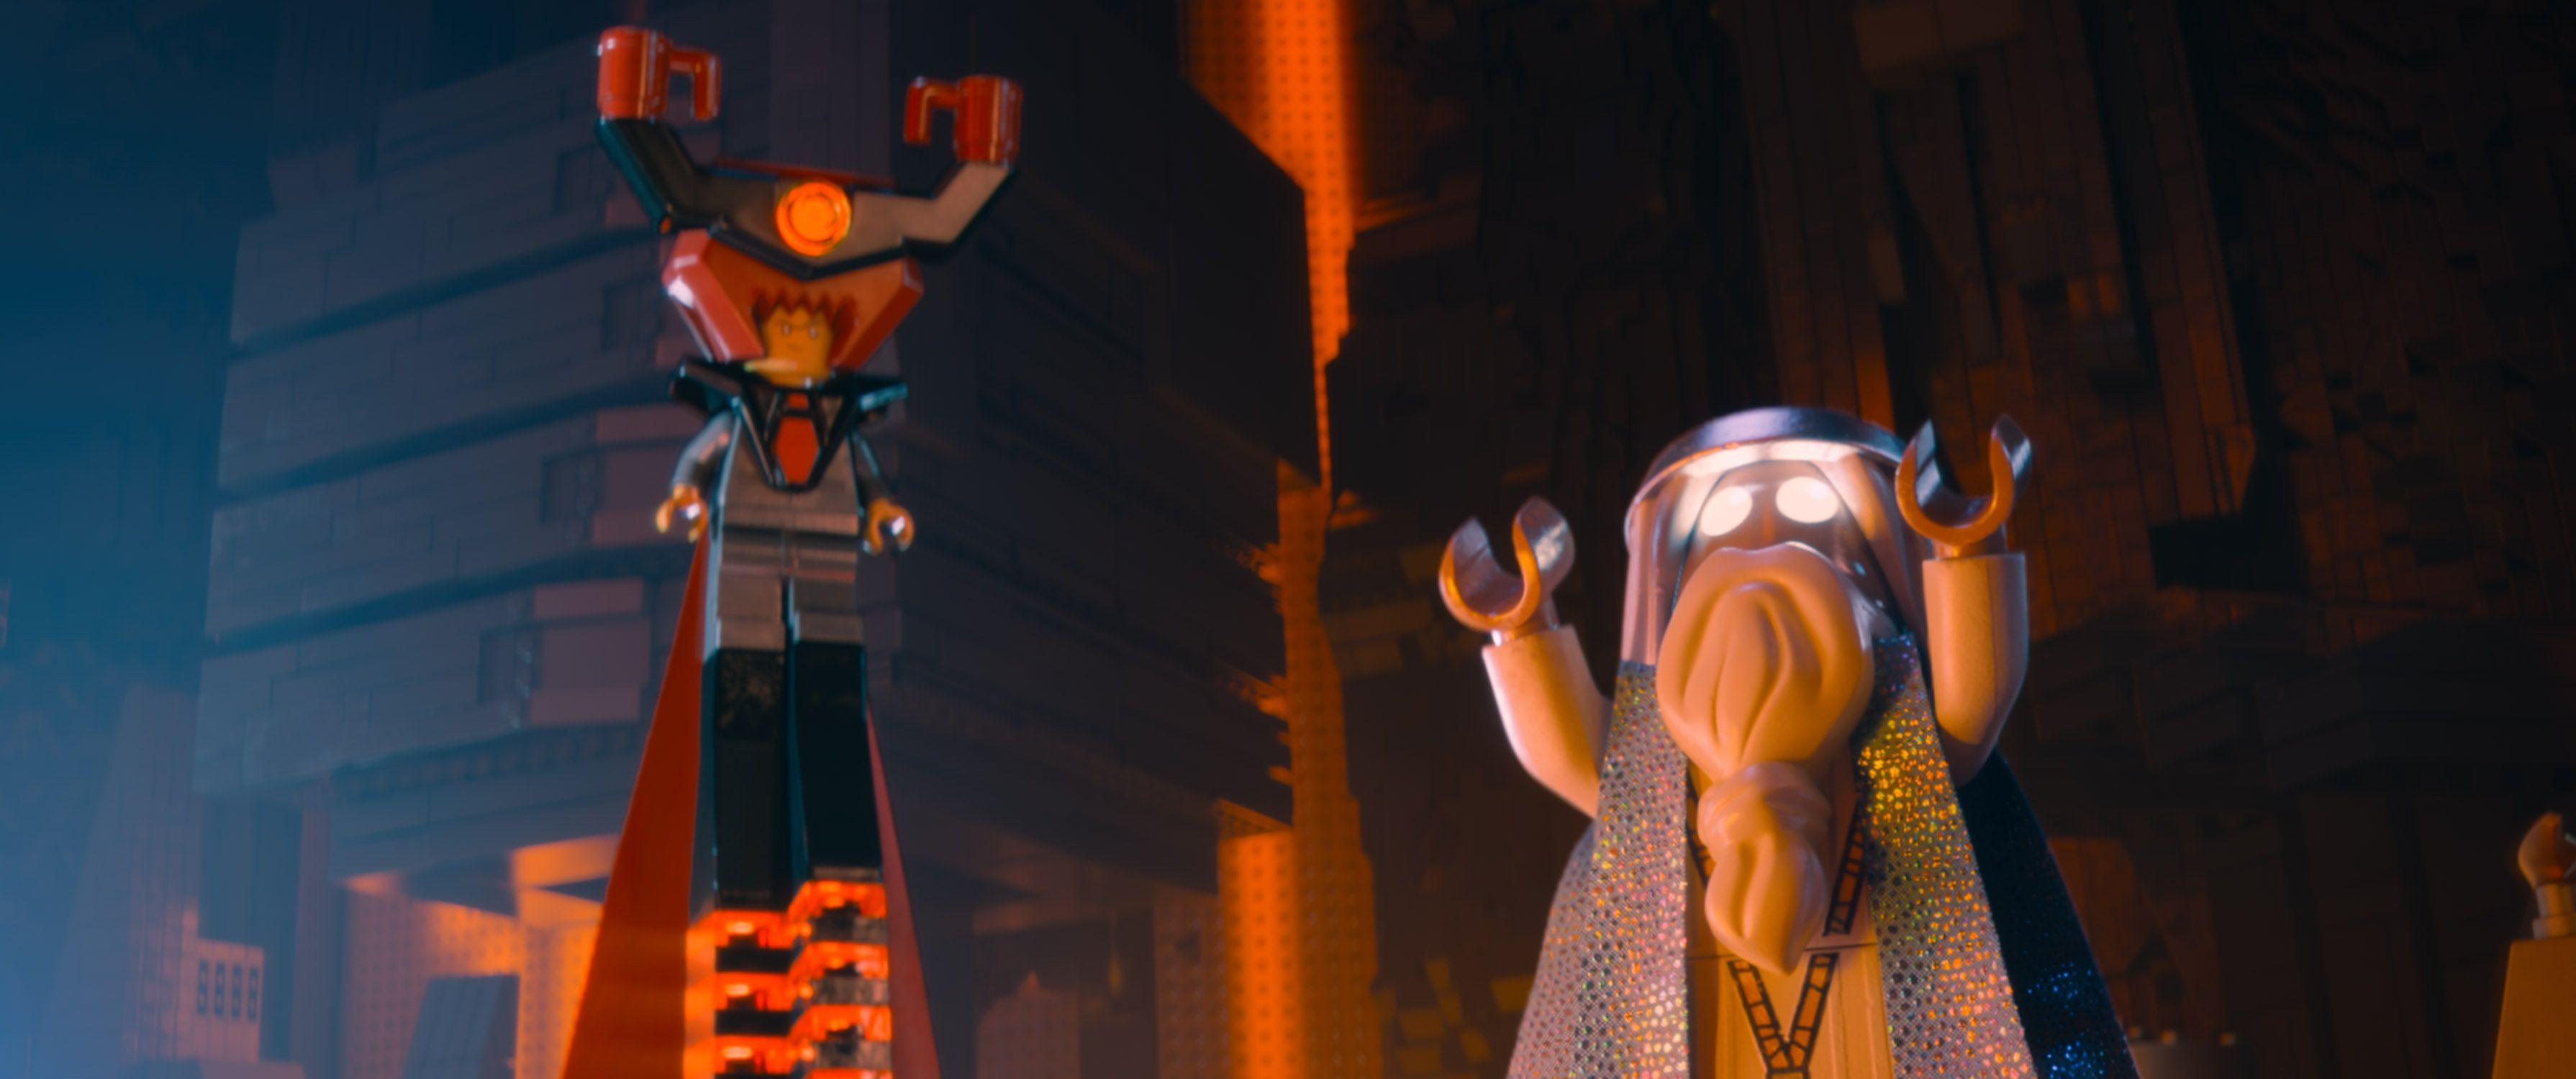 Lego Movie Characters Morgan Freeman